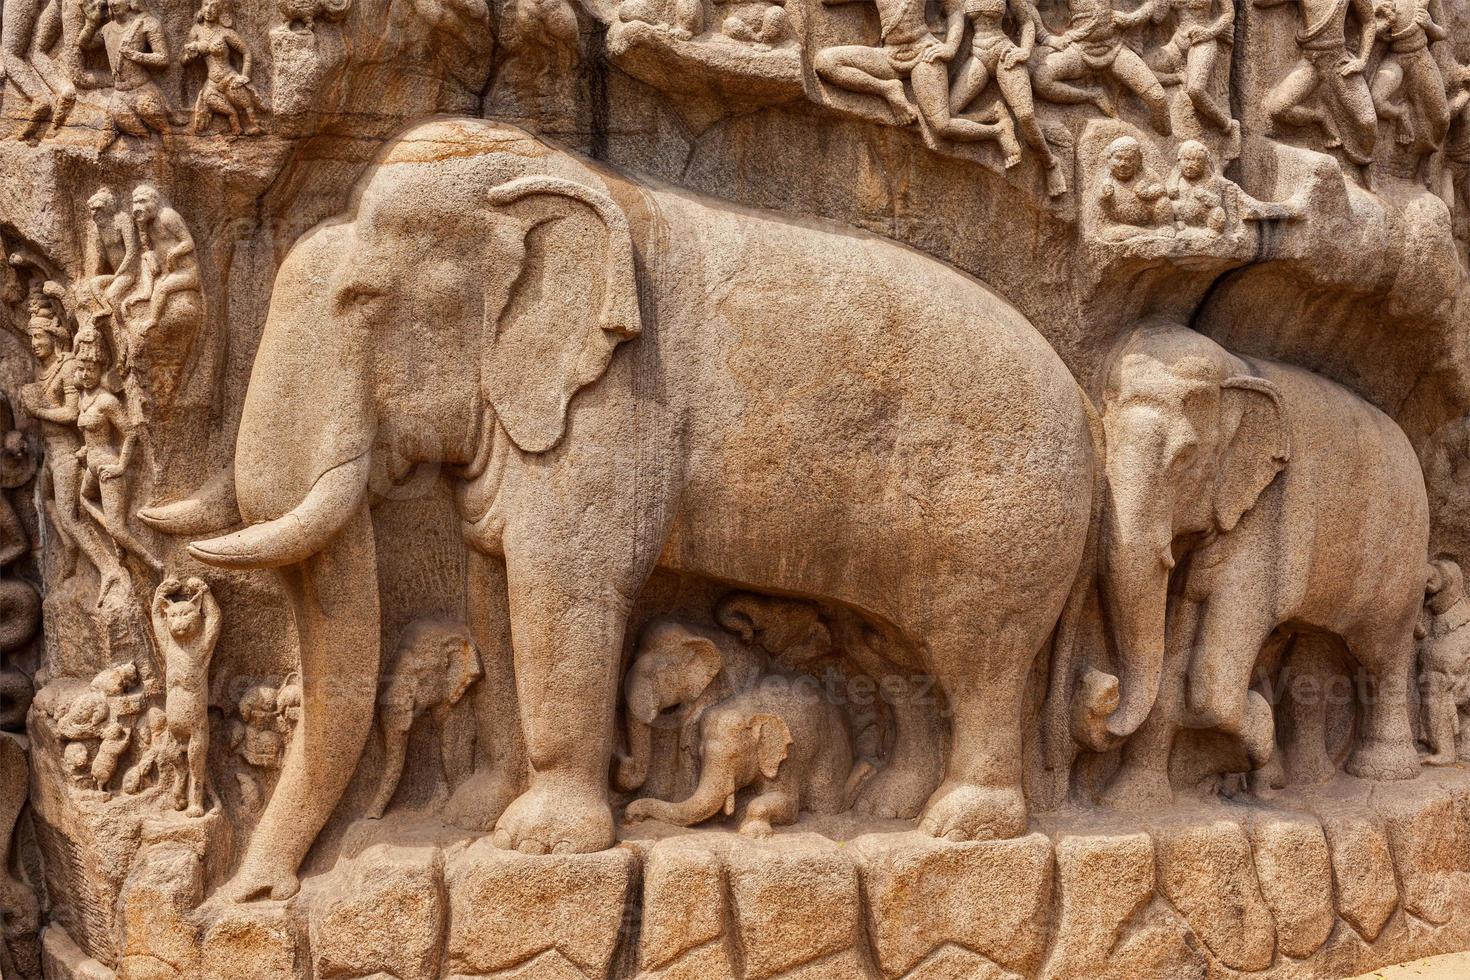 descente du Gange et pénitence d'Arjuna, Mahabalipuram, Tamil photo